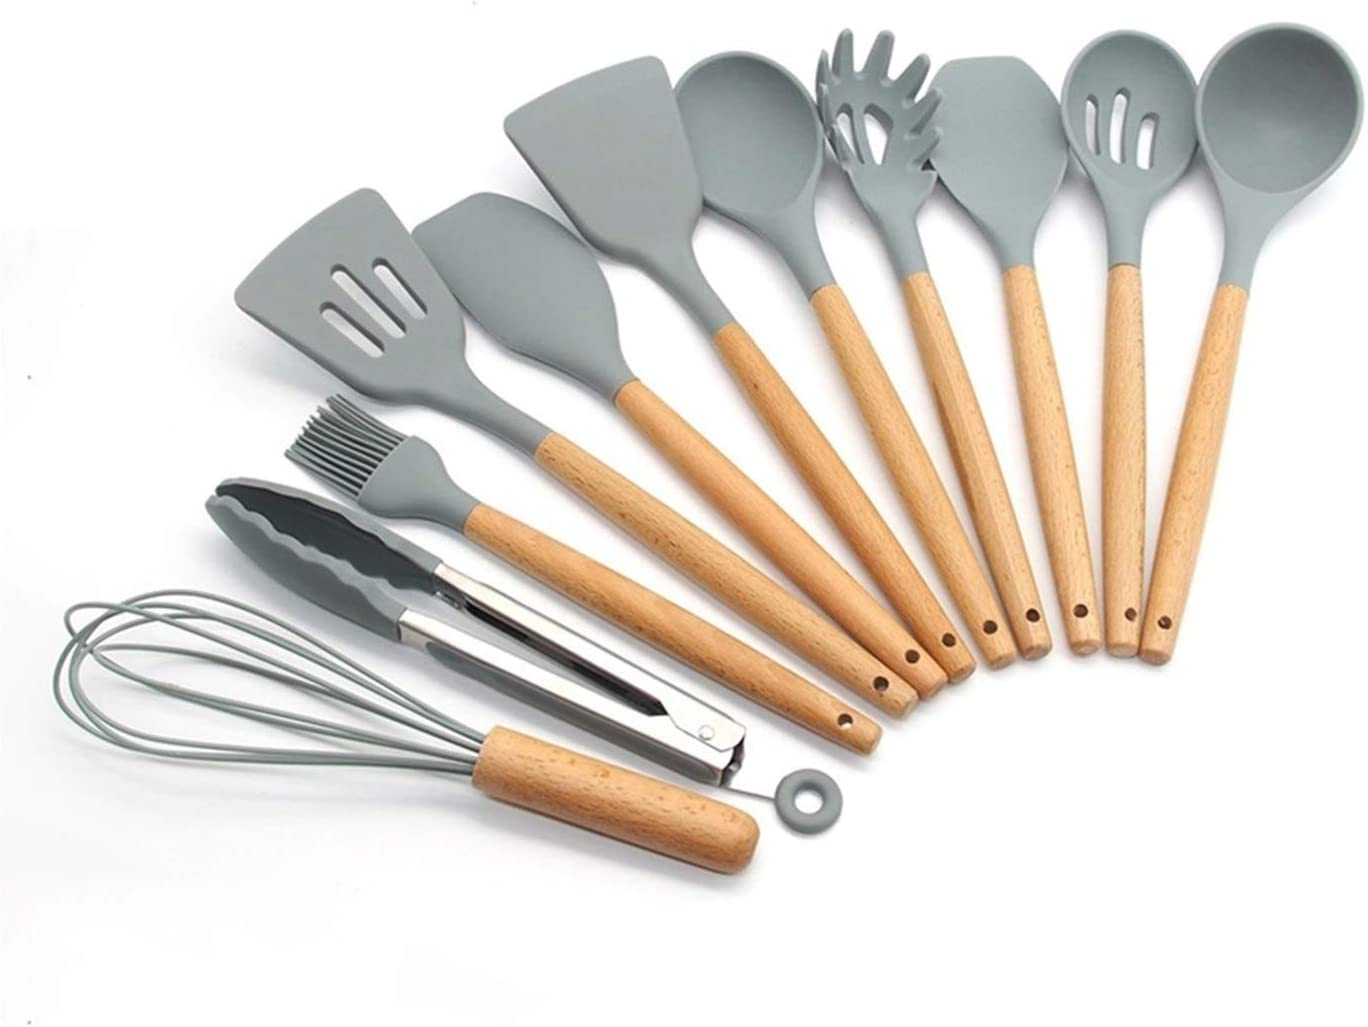 Regular discount YIBOZY Silicone Cooking Utensils 11 13Pcs Utensil 12 Oakland Mall Kitchen Set